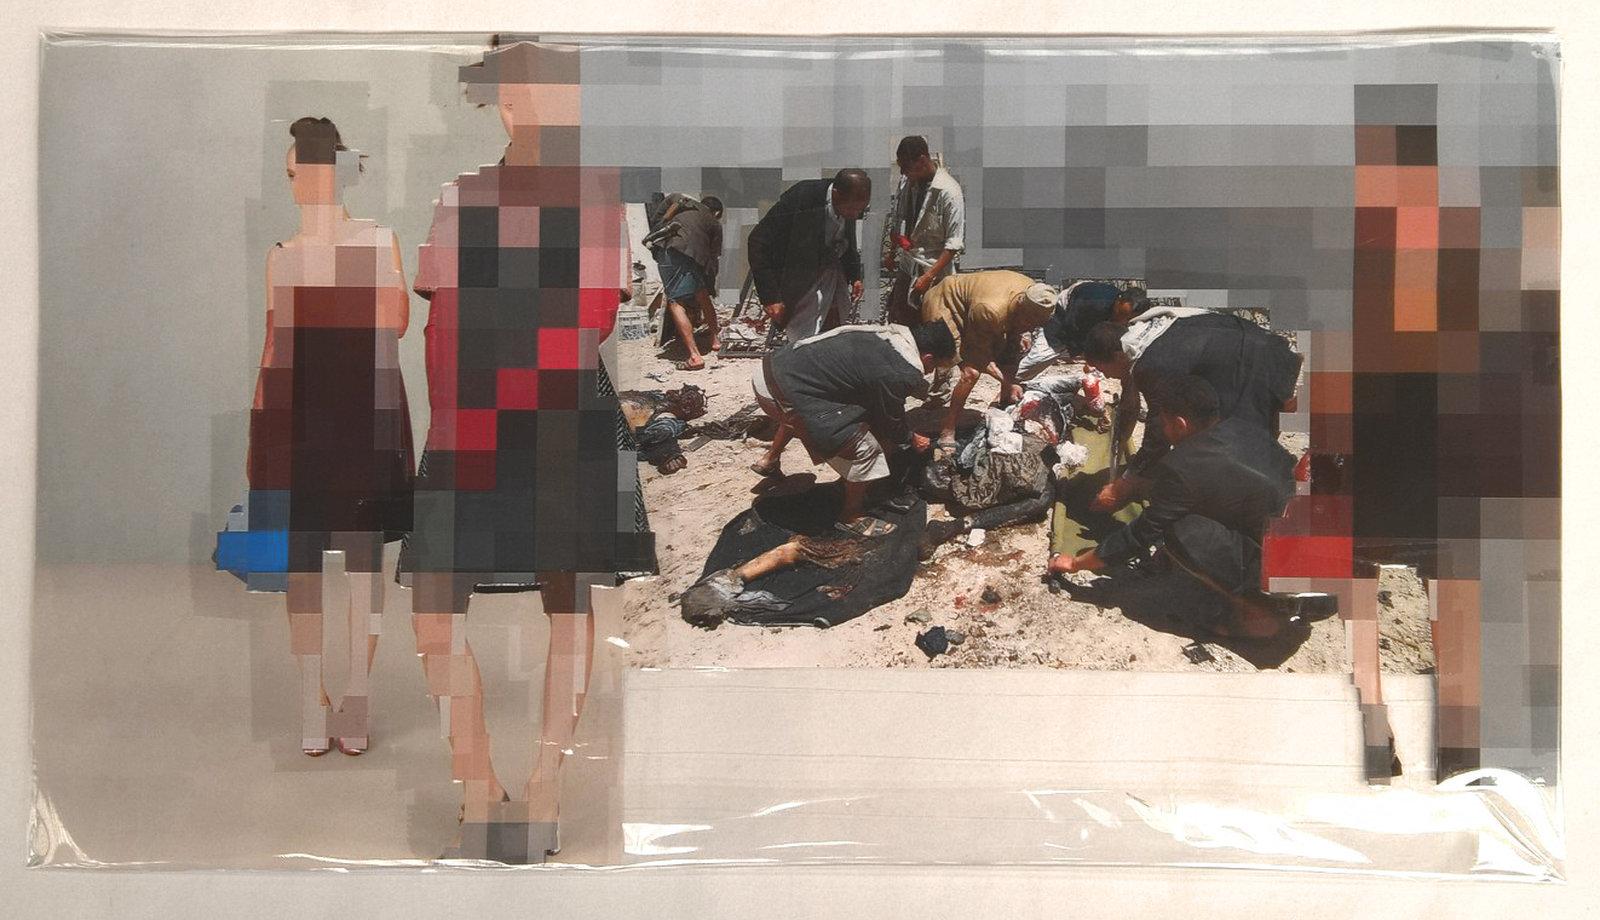 Pixel-Collage nº66, 2016, Prints, tape, transparent sheet, 28x50,5 cm